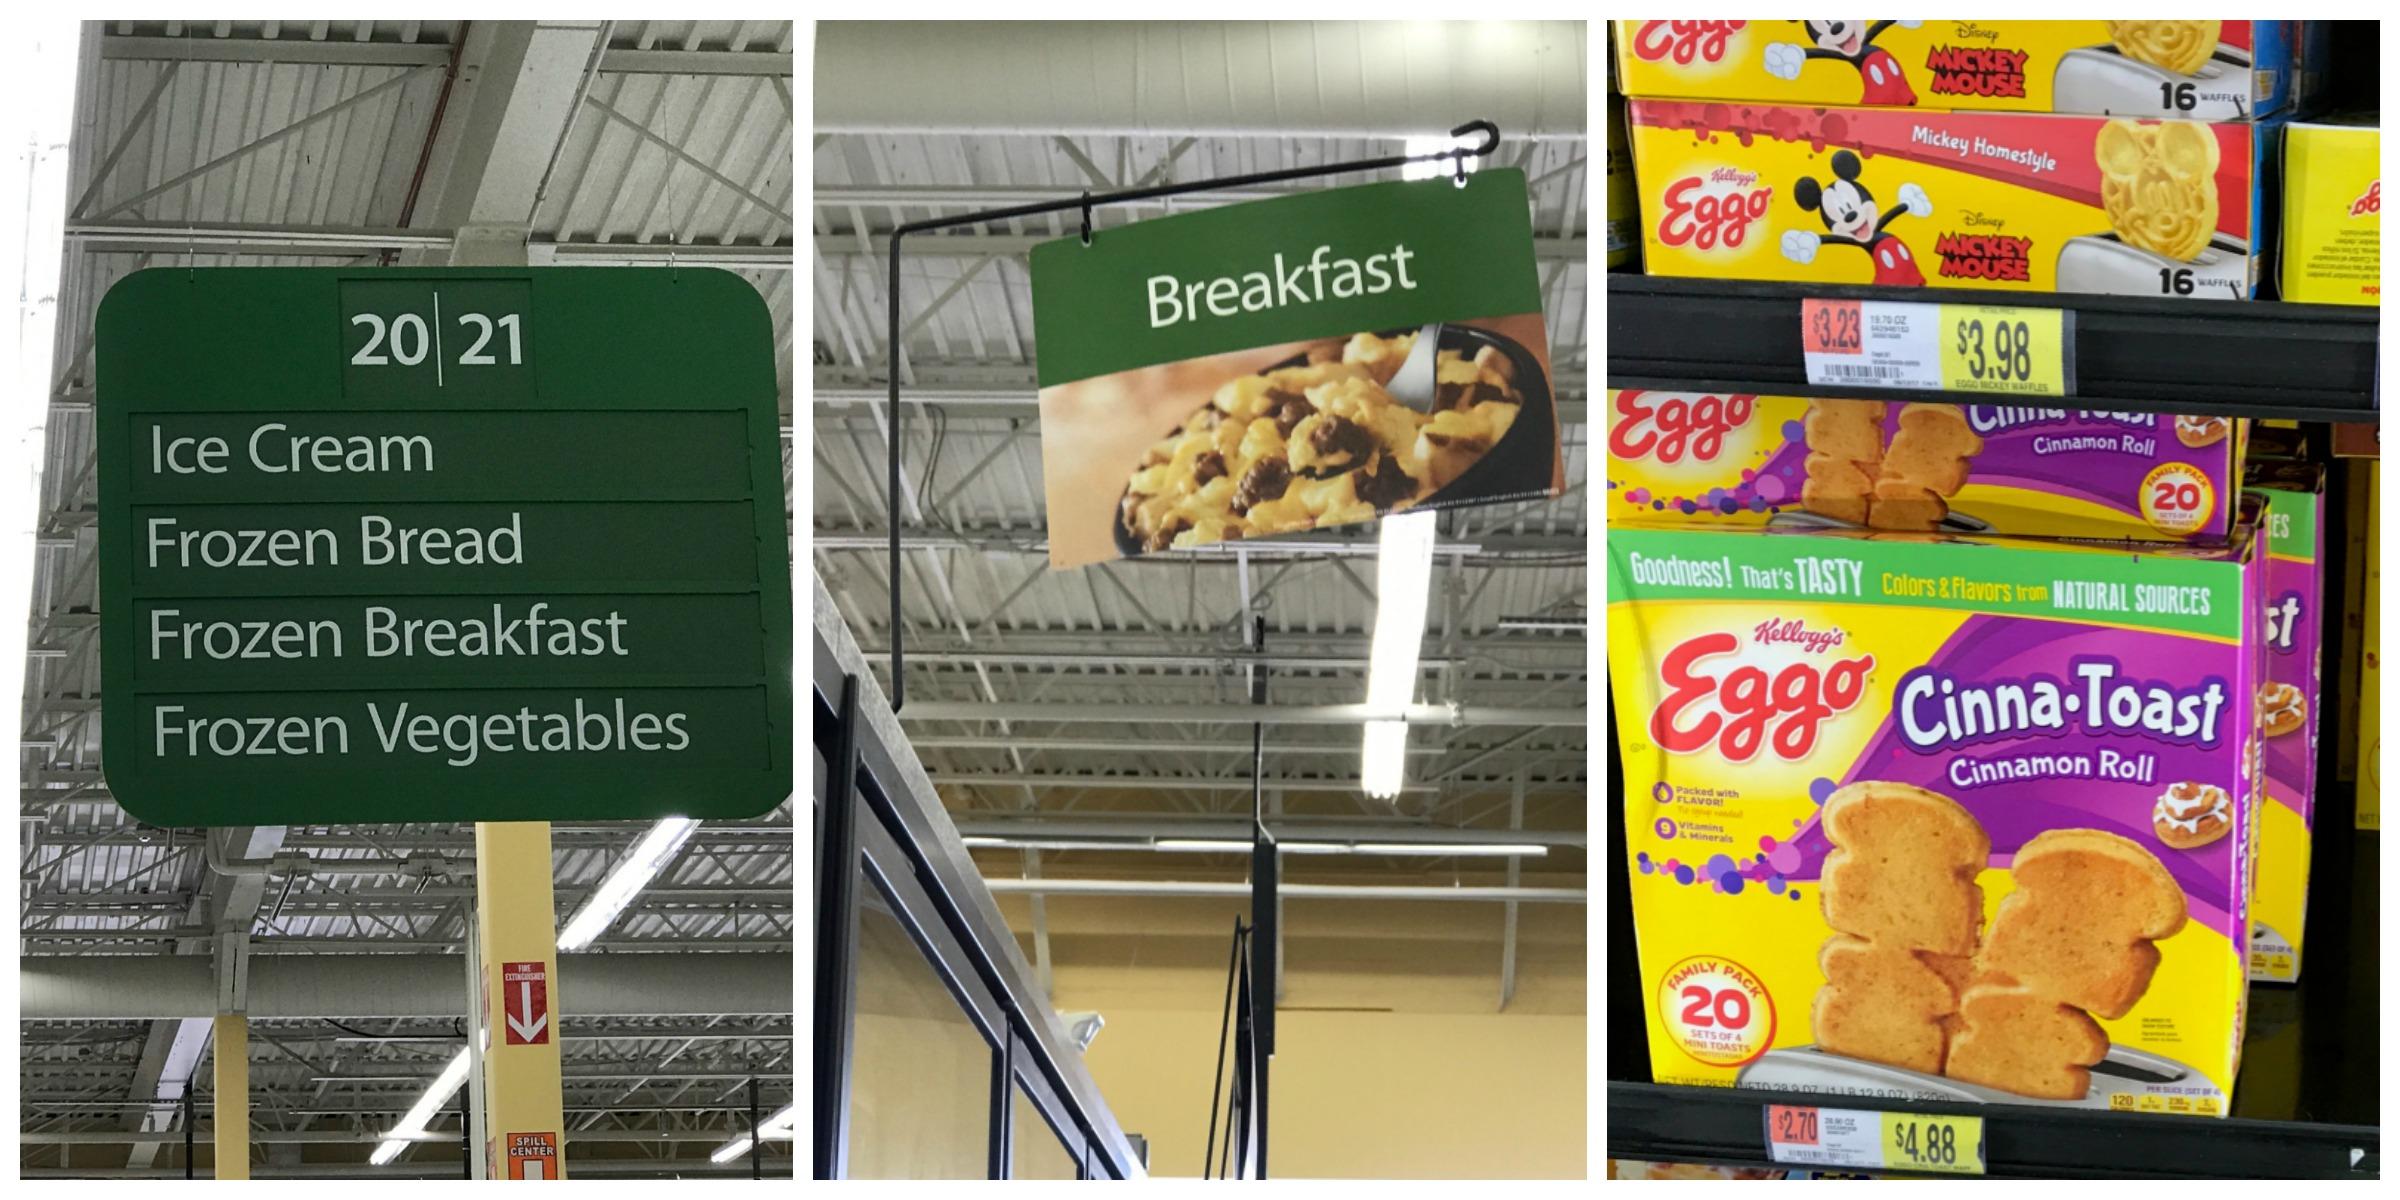 Eggo CinnaToast Product Collage for Walmart